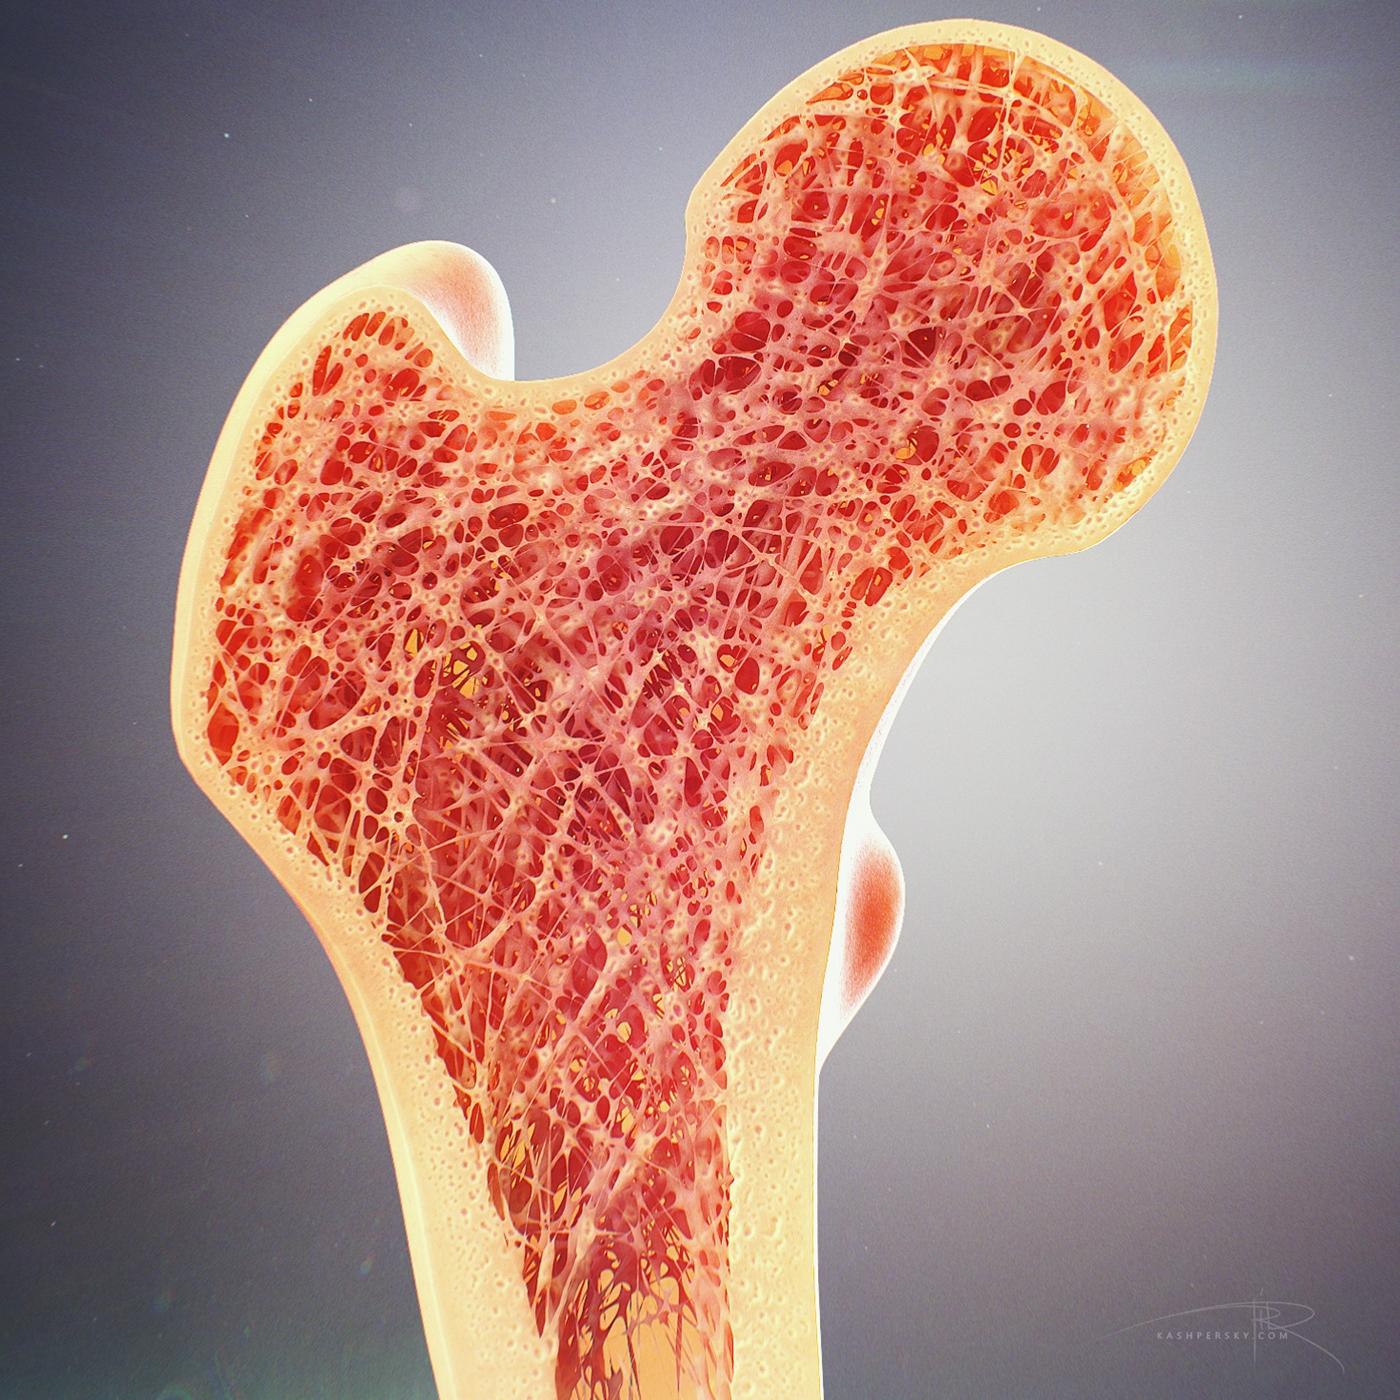 bone-cross-section.jpg